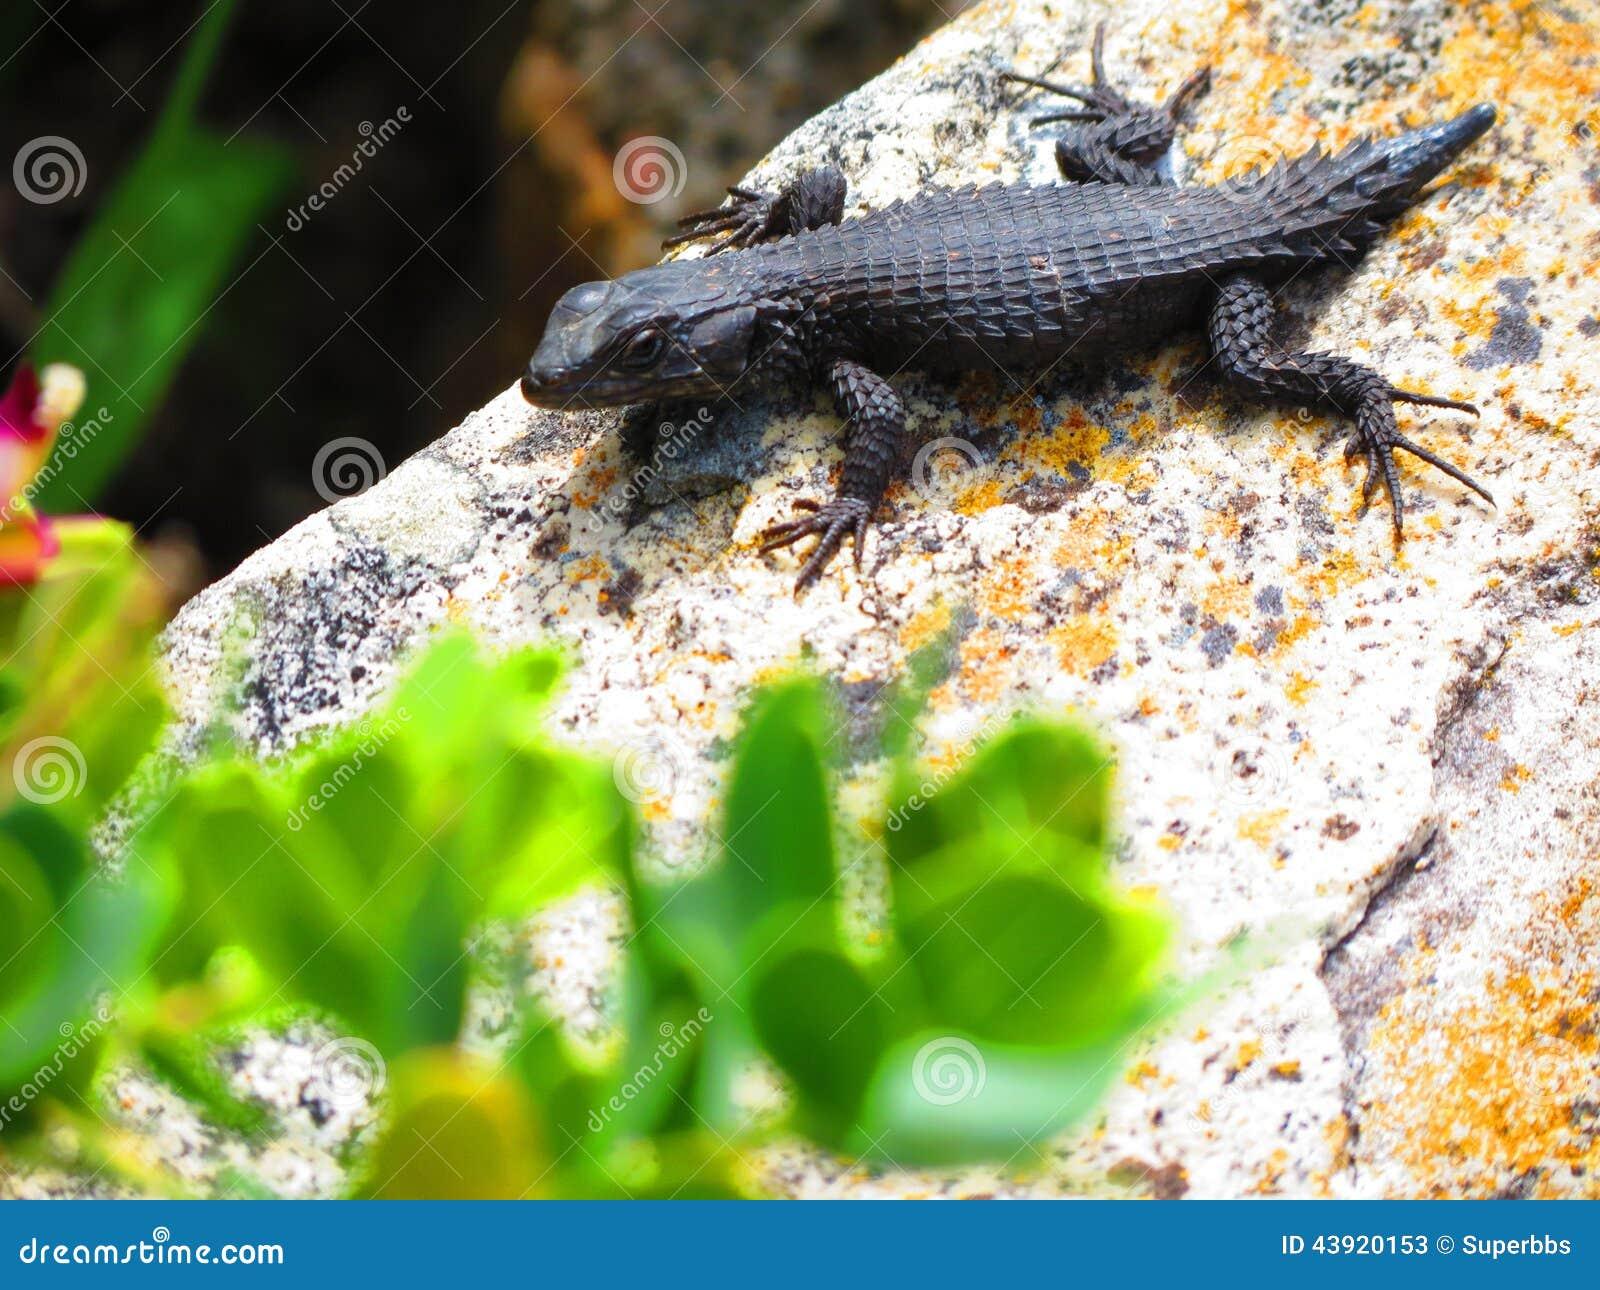 Black Lizard On Rock Stock Photo Image 43920153